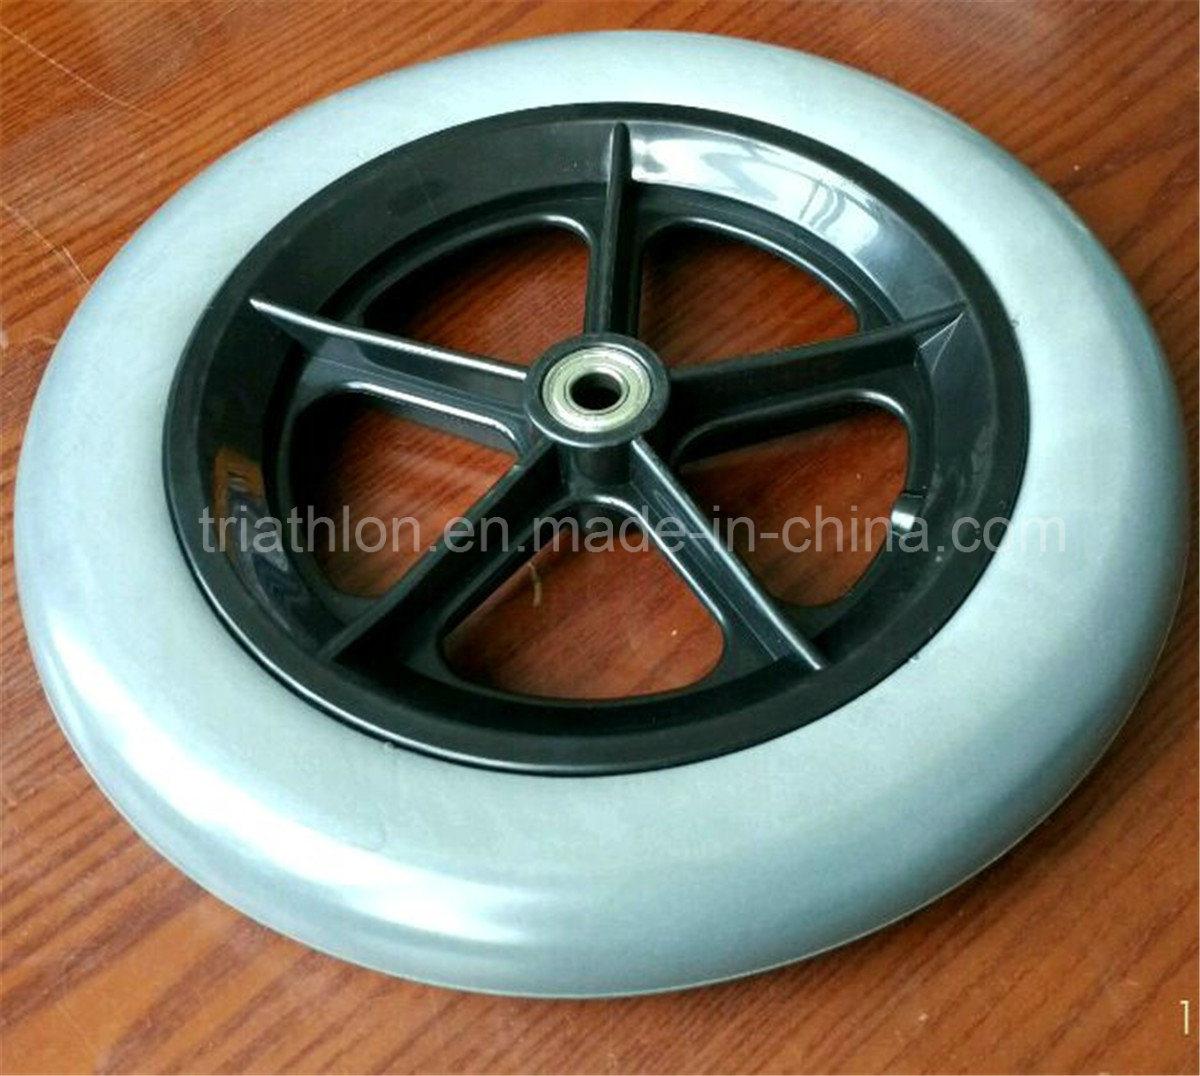 12X1.75 12X2 12X2.125 12X3 Flat Free Bicycle Wheelchair Foam Wheel